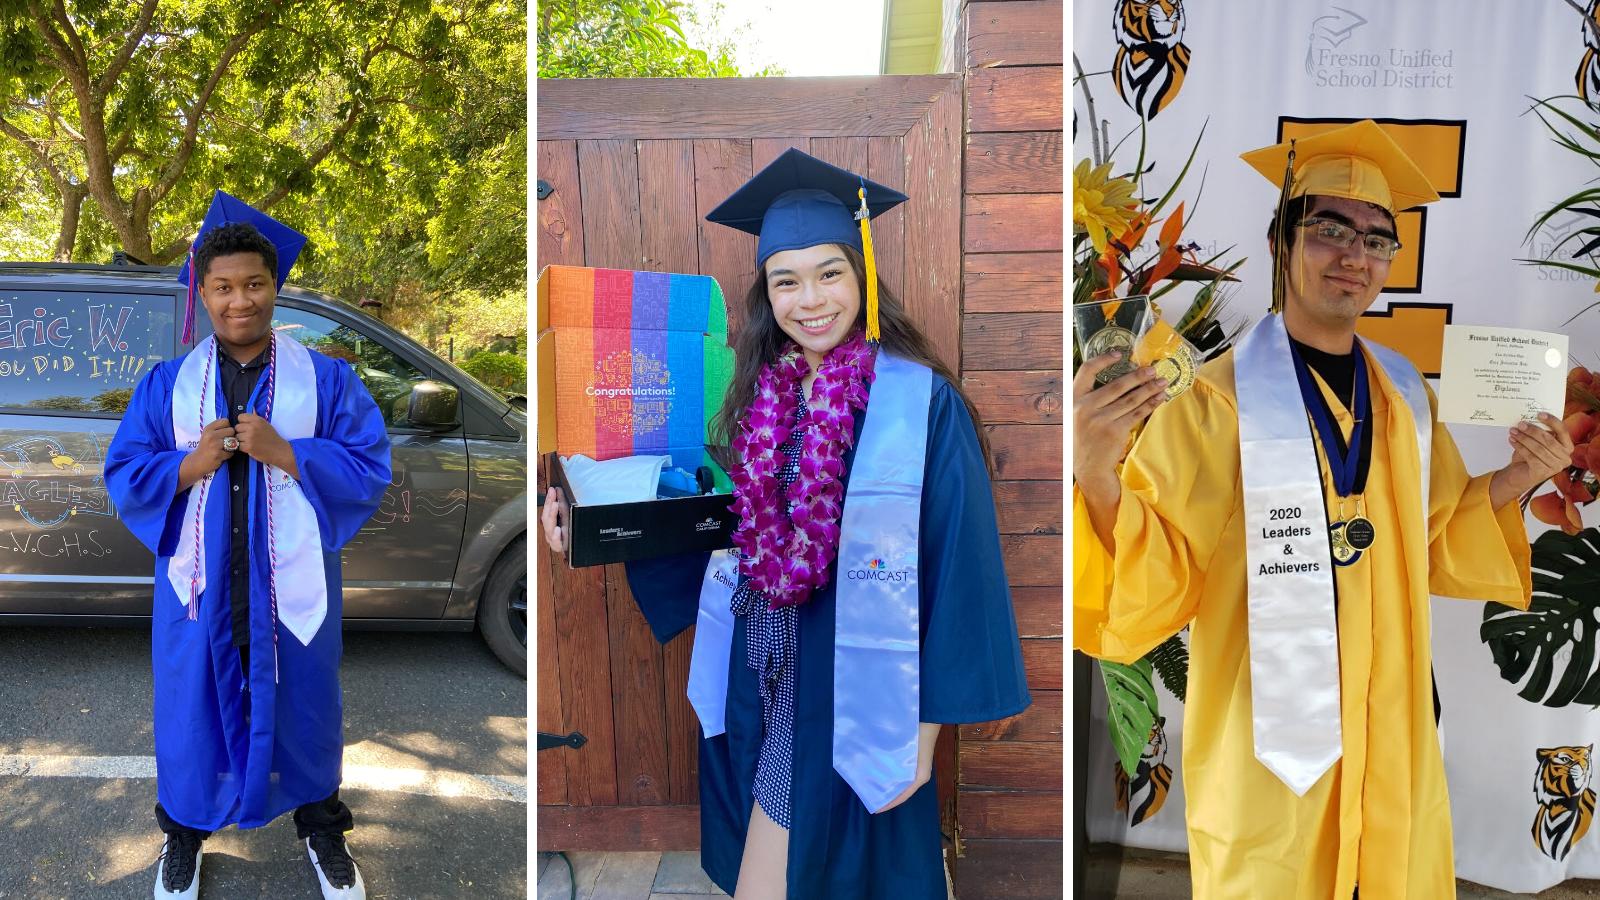 Three Leaders and Achievers scholarship winners